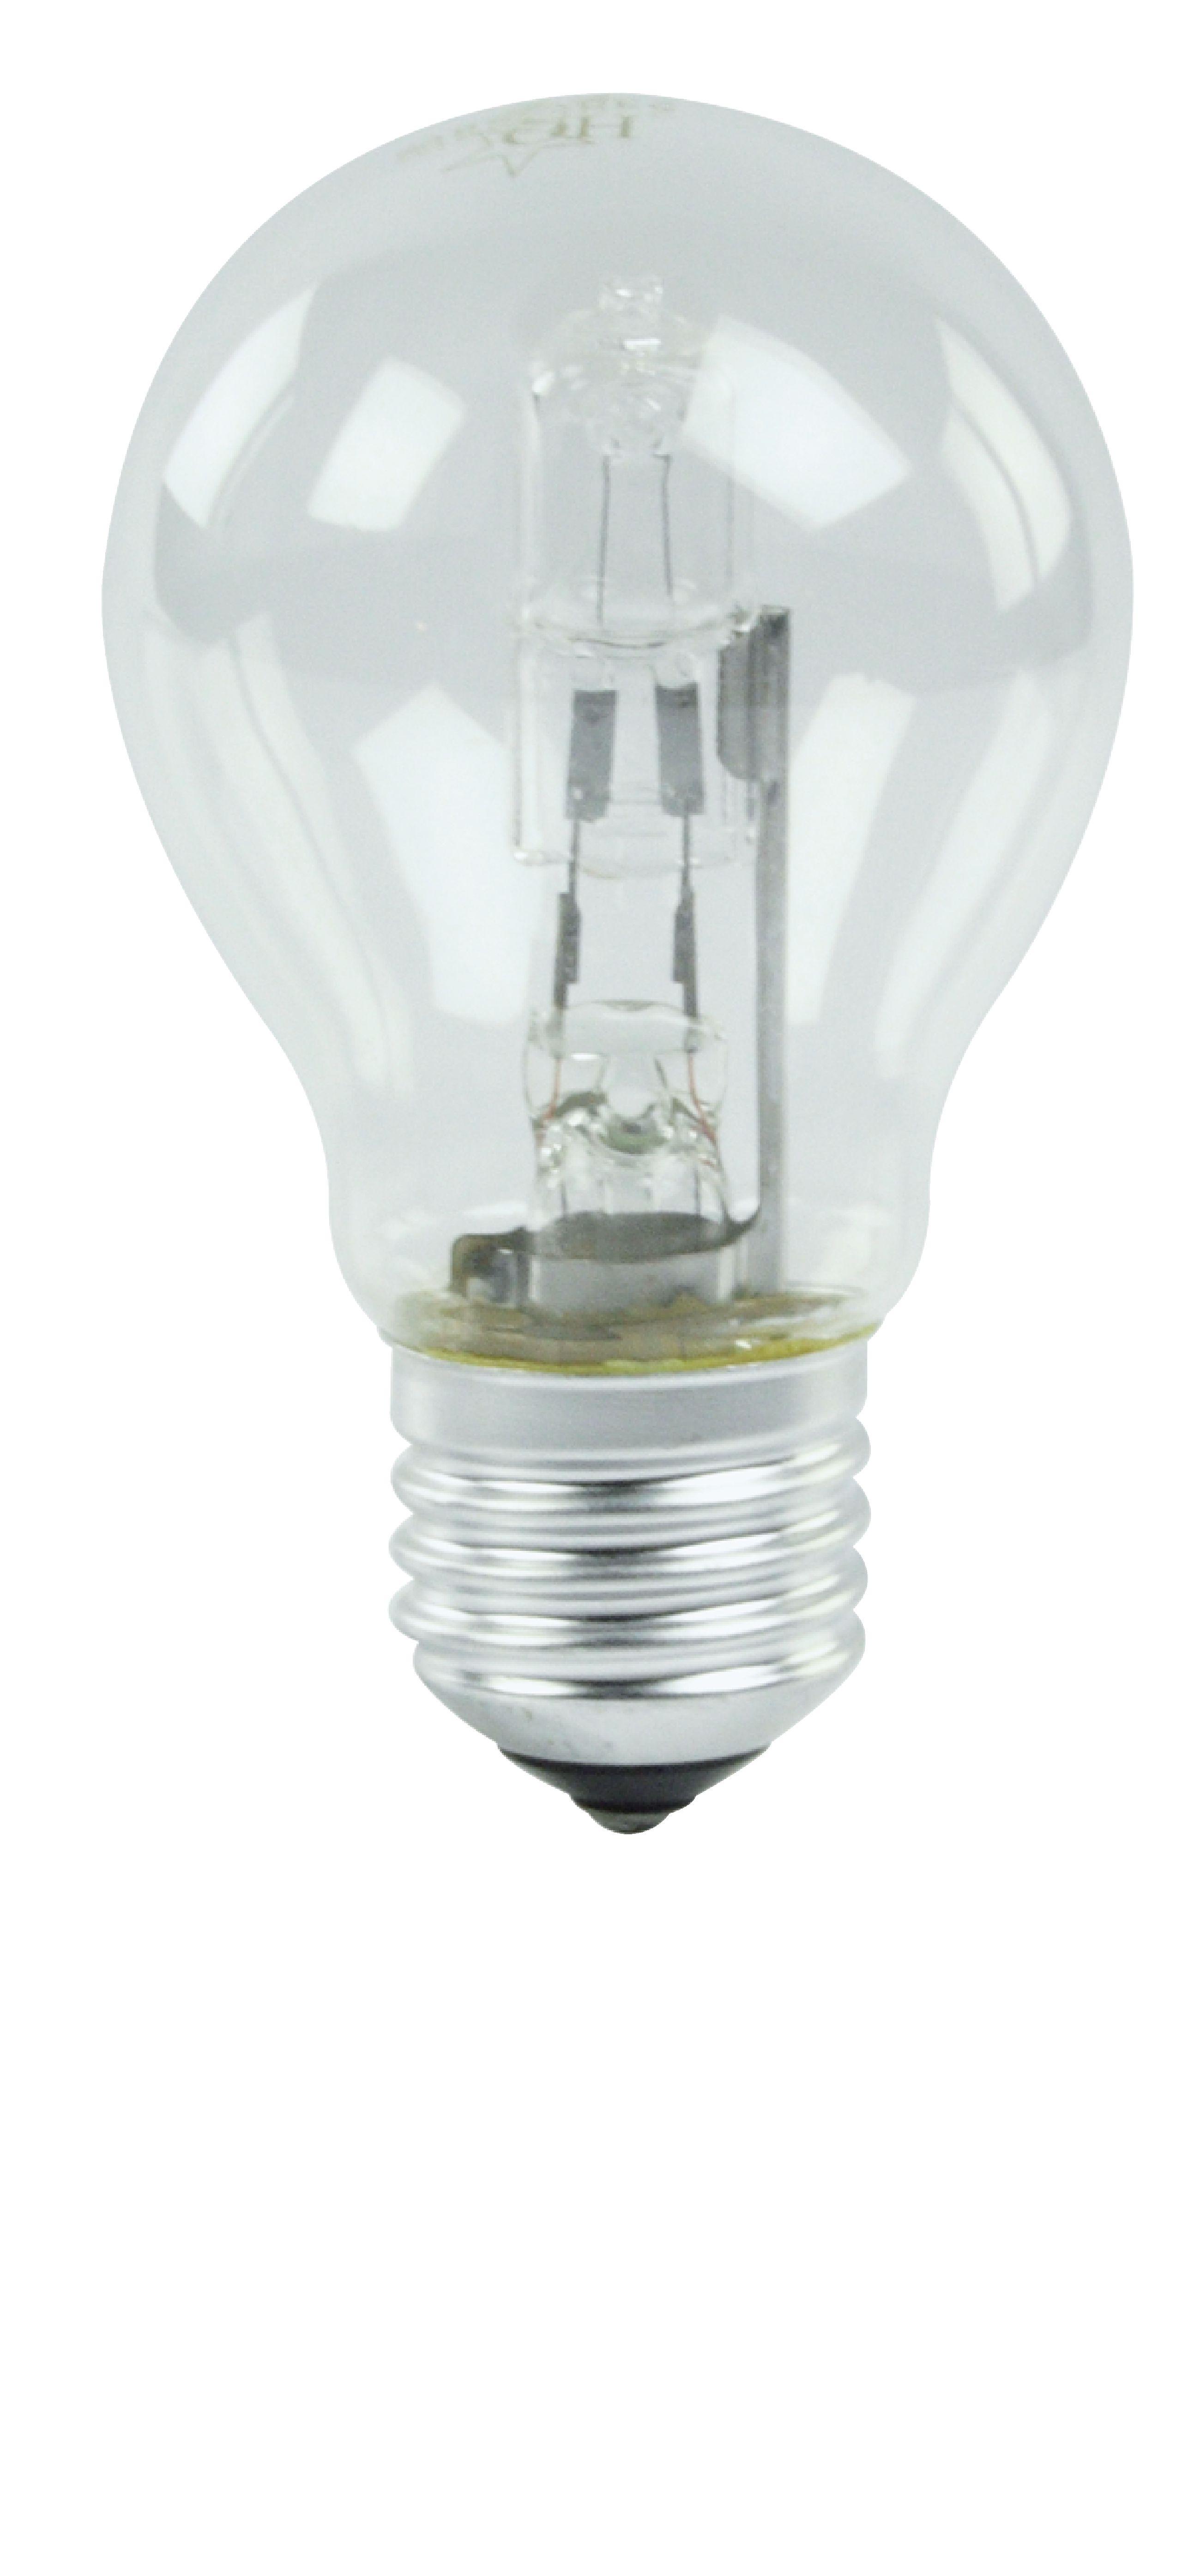 h e27 05 hq eco e27 70 w halogen a55 bulb electronic. Black Bedroom Furniture Sets. Home Design Ideas